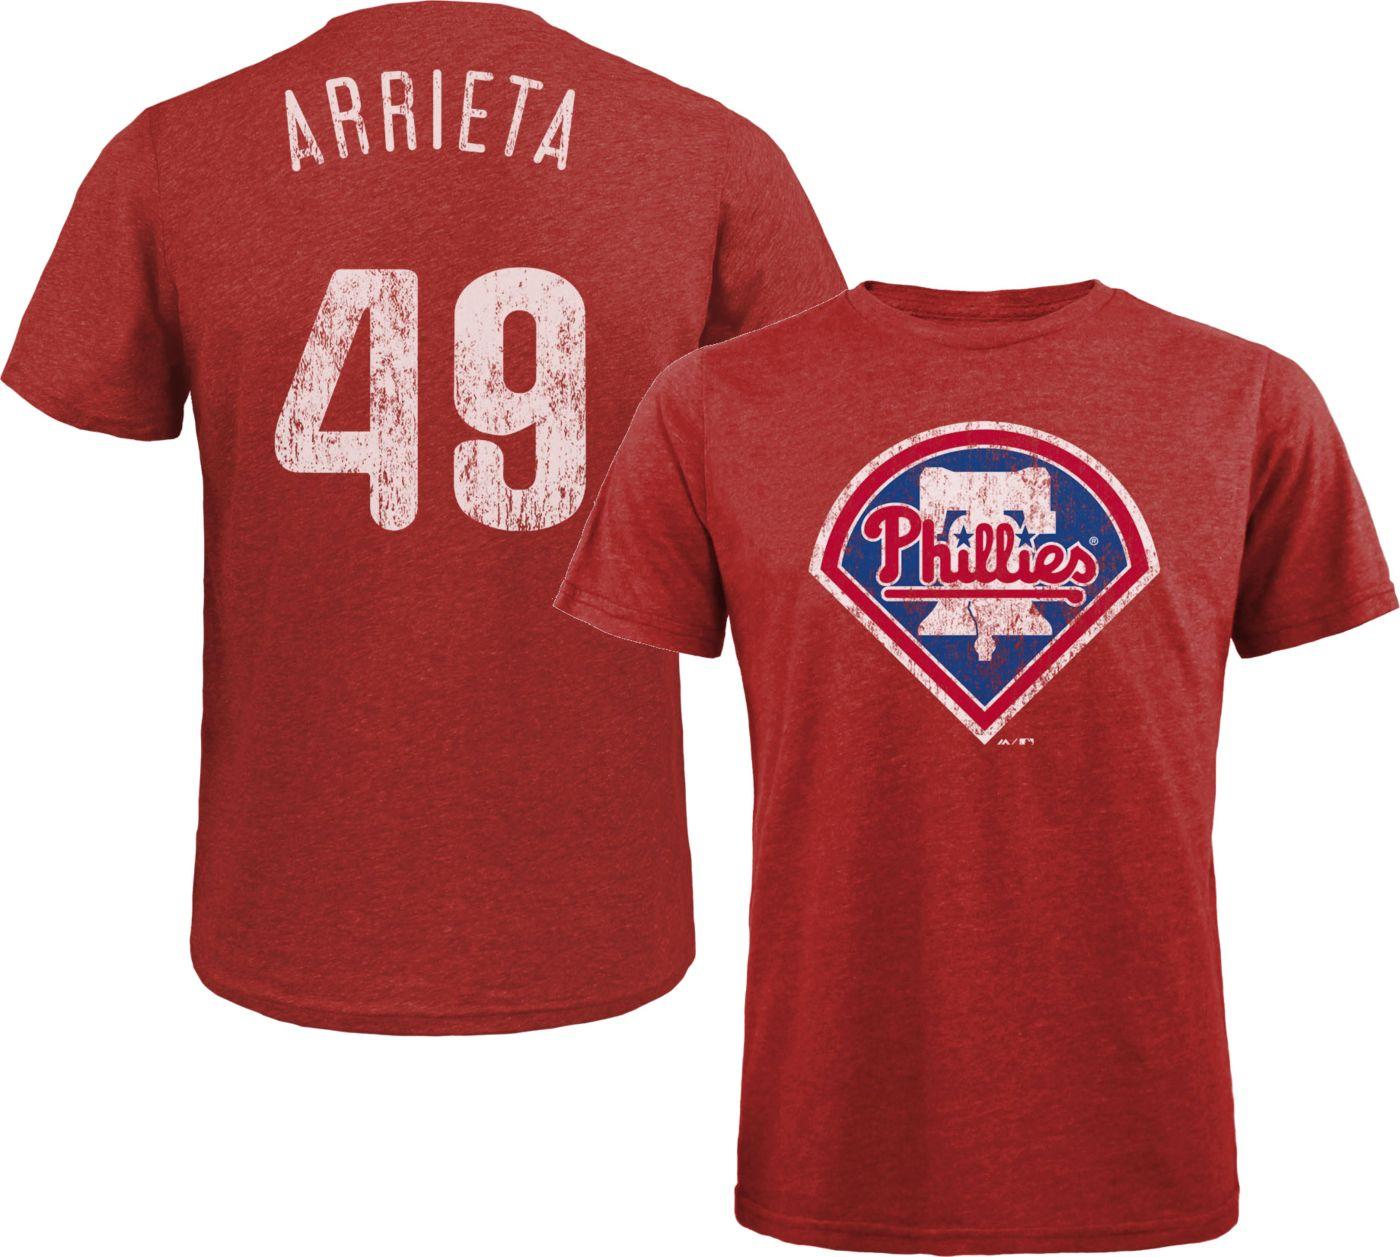 Majestic Threads Men's Philadelphia Phillies Jake Arrieta Tri-Blend T-Shirt